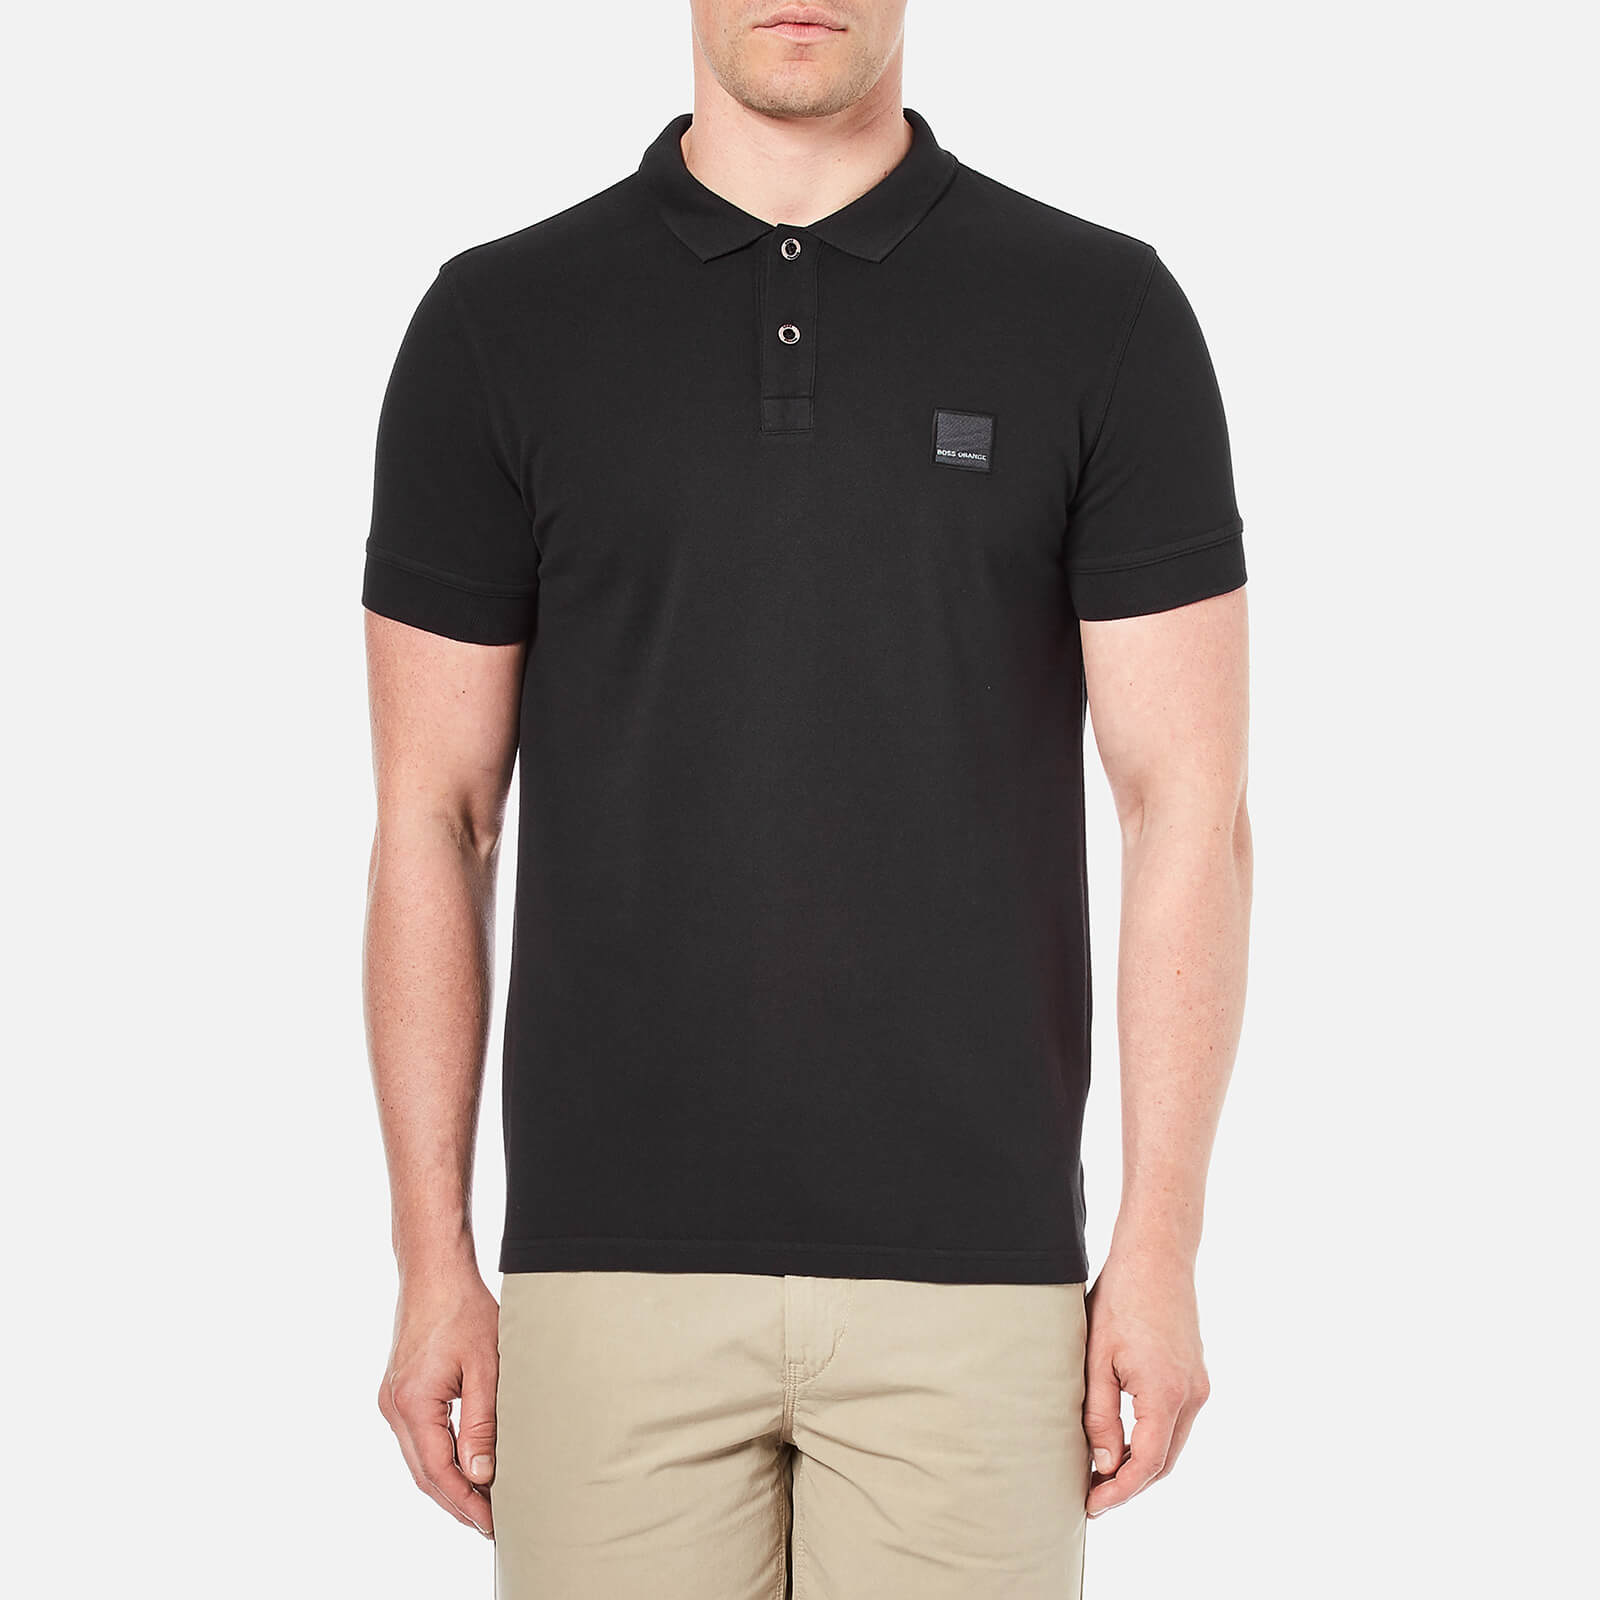 51ed06afc3d3 BOSS Orange Men's Pascha Slim Block Branded Polo Shirt - Black - Free UK  Delivery over £50